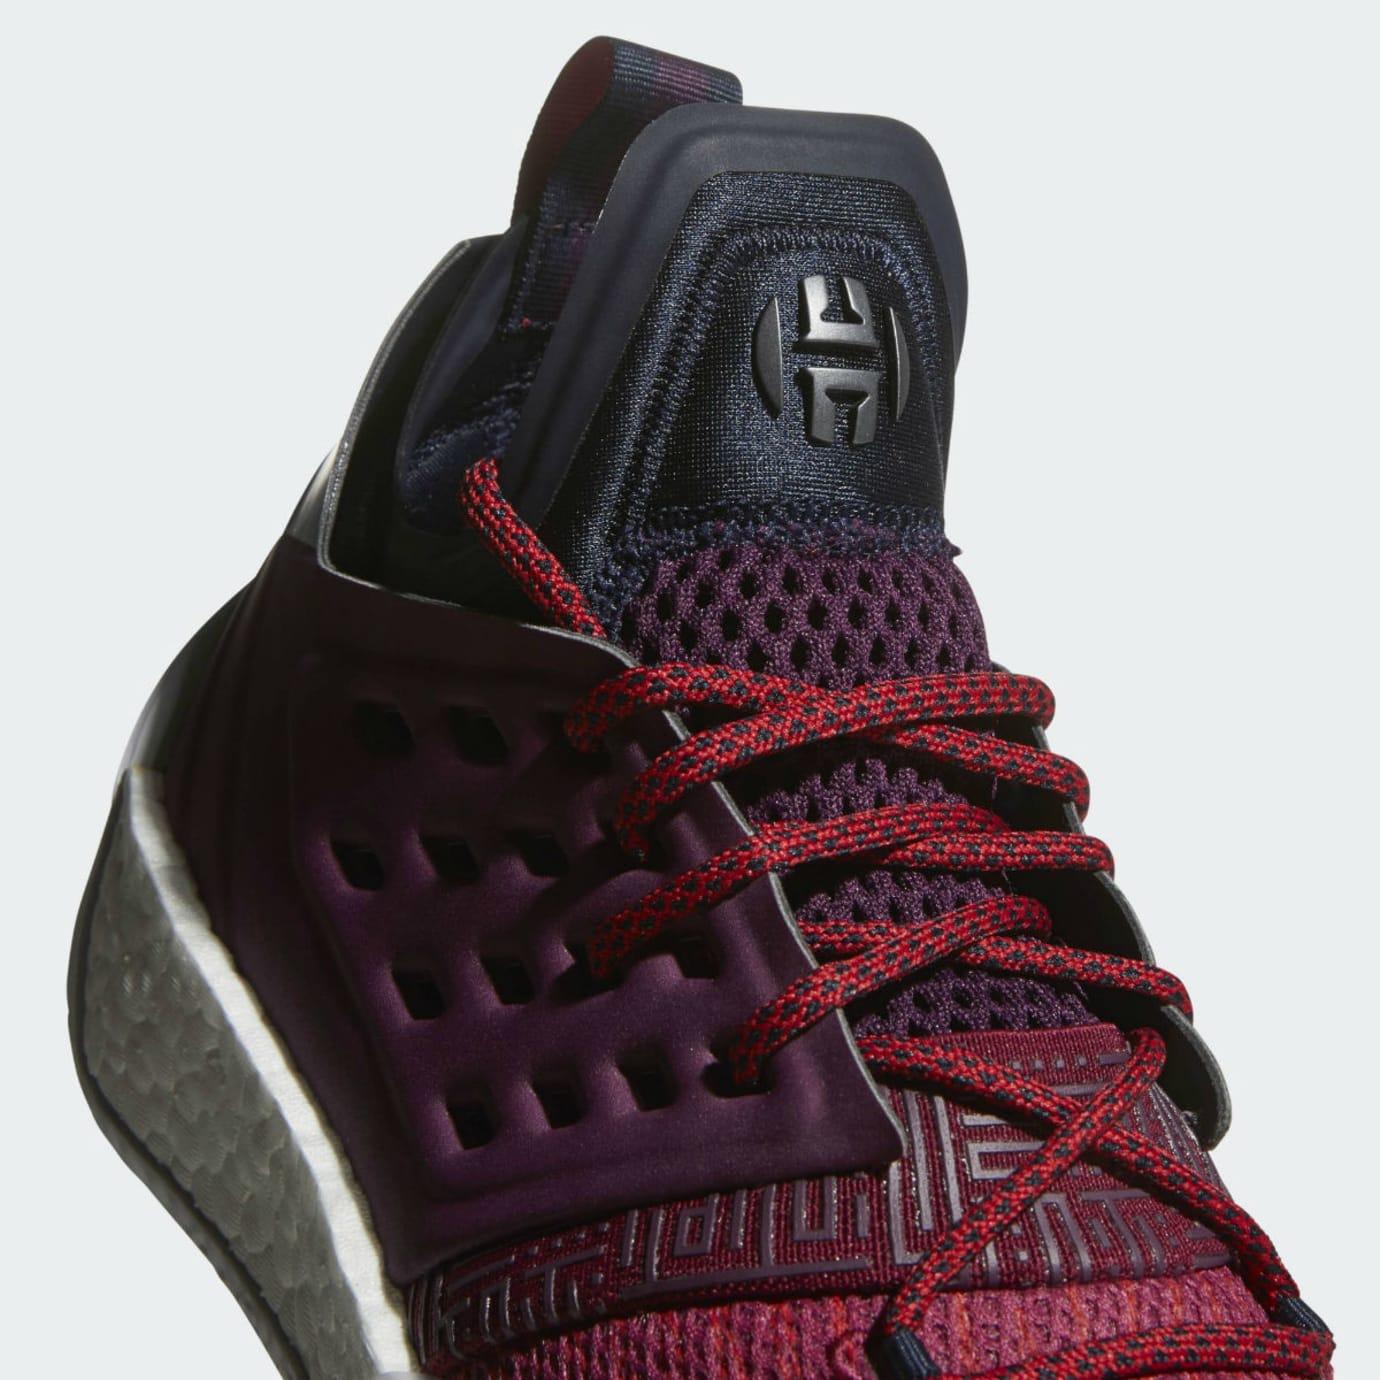 Adidas Harden Vol. 2 Maroon Release Date AH2124 Tongue